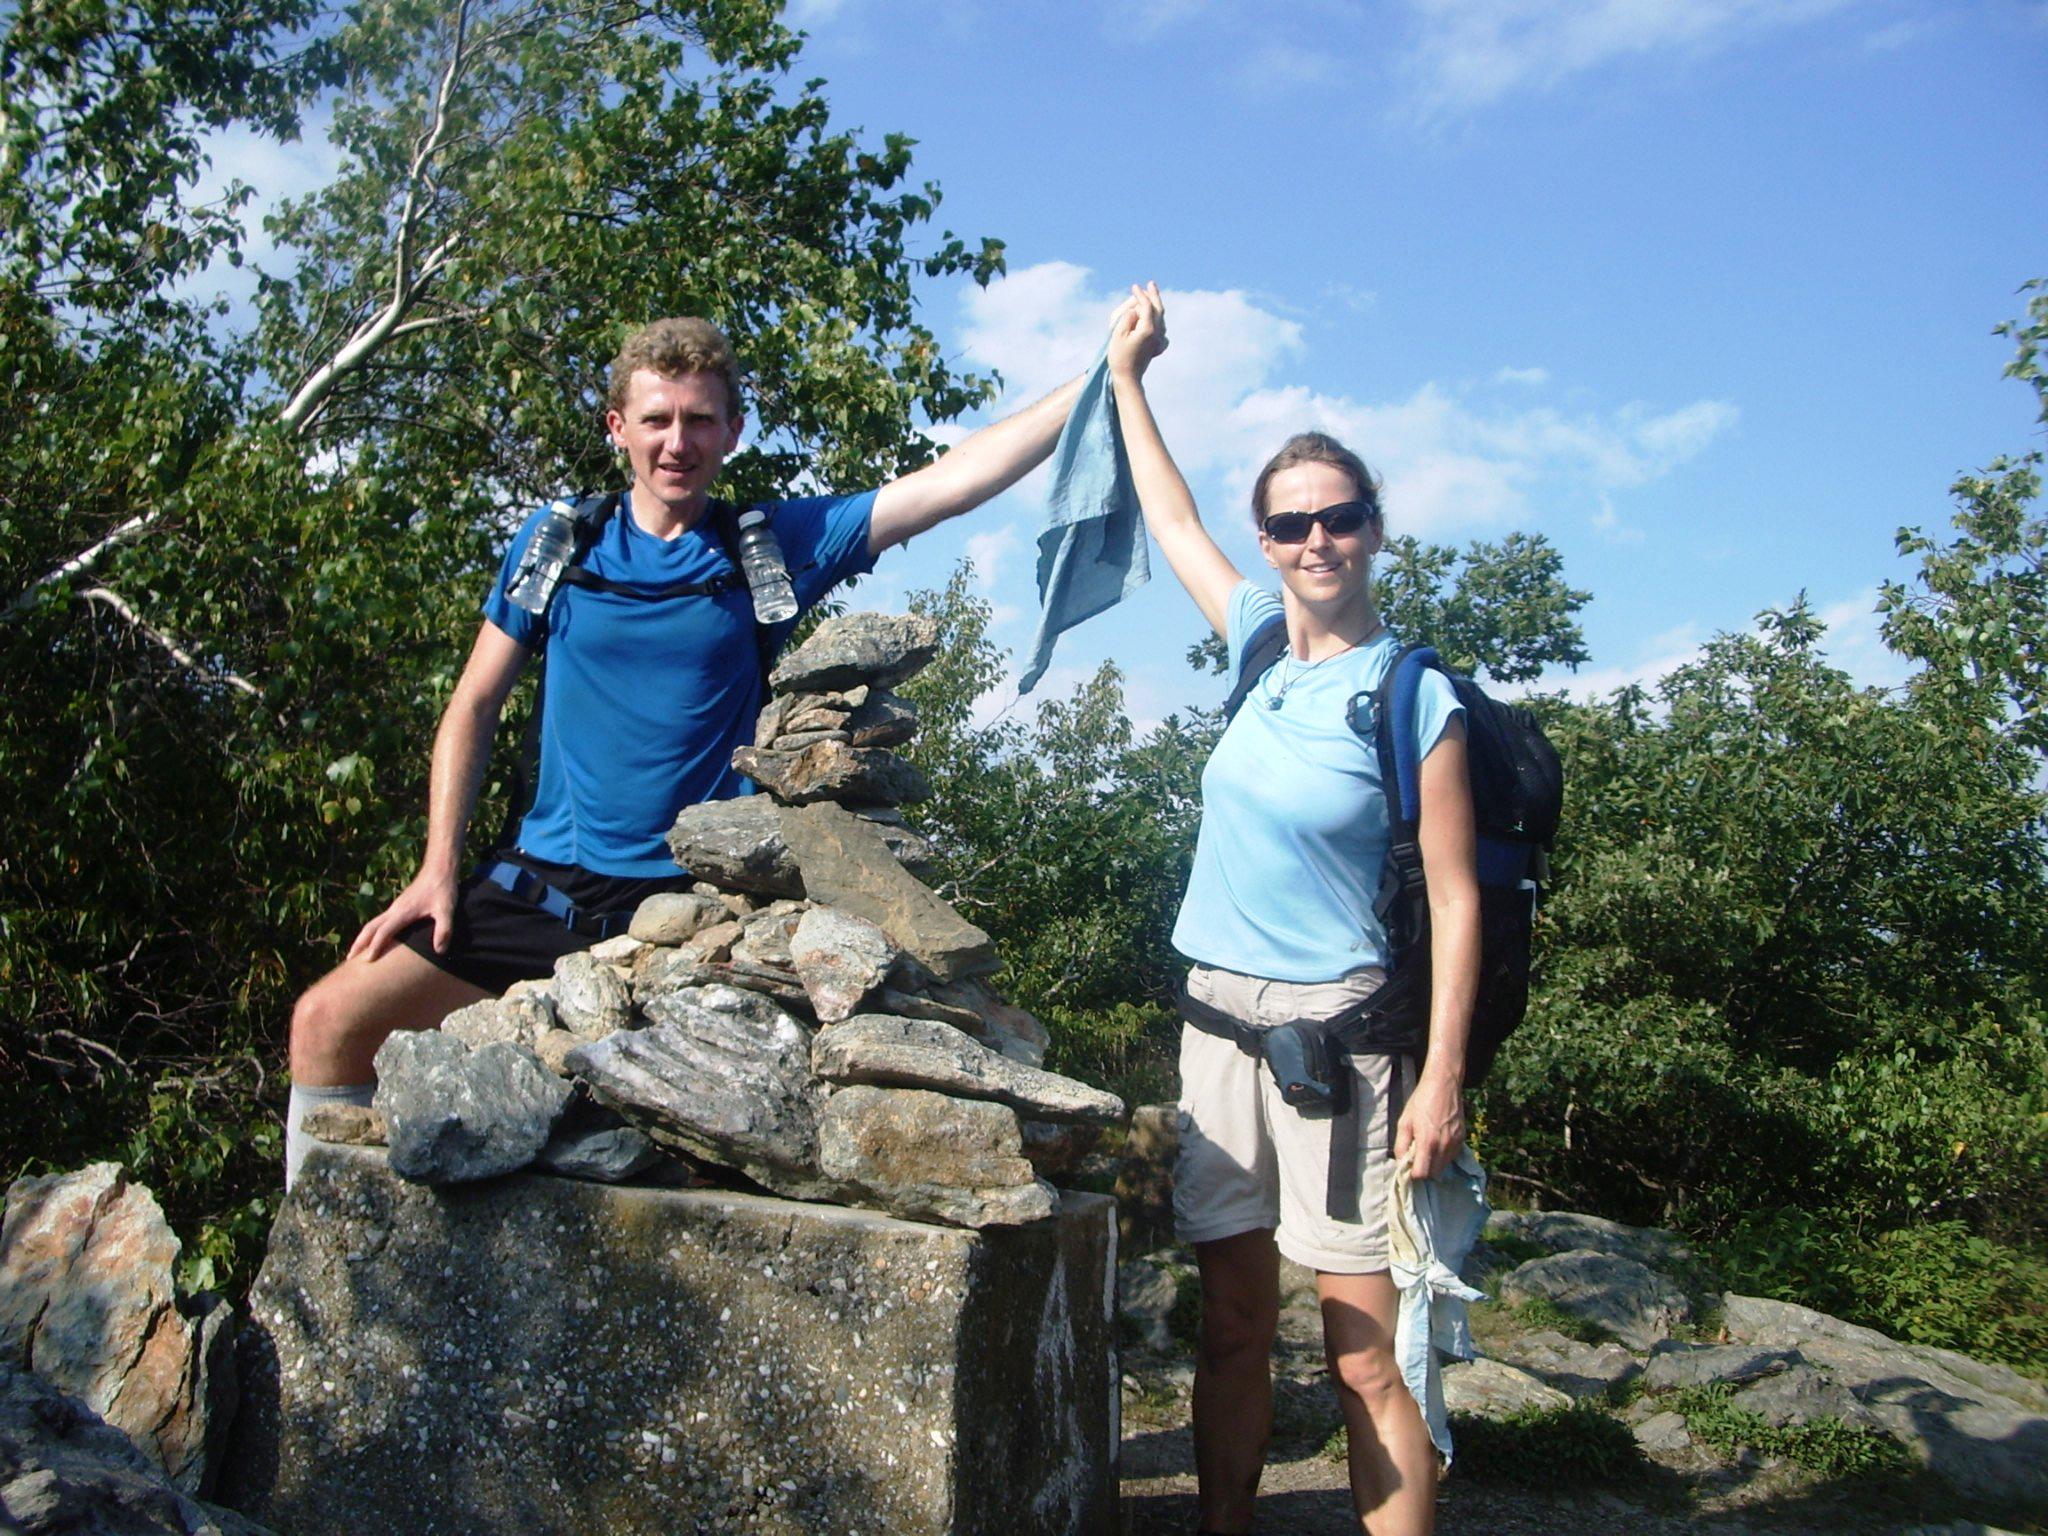 Tom Nowakowski and his wife celebrate the cleansing exuberance of an extended trek. Photo: Tom Nowakowski